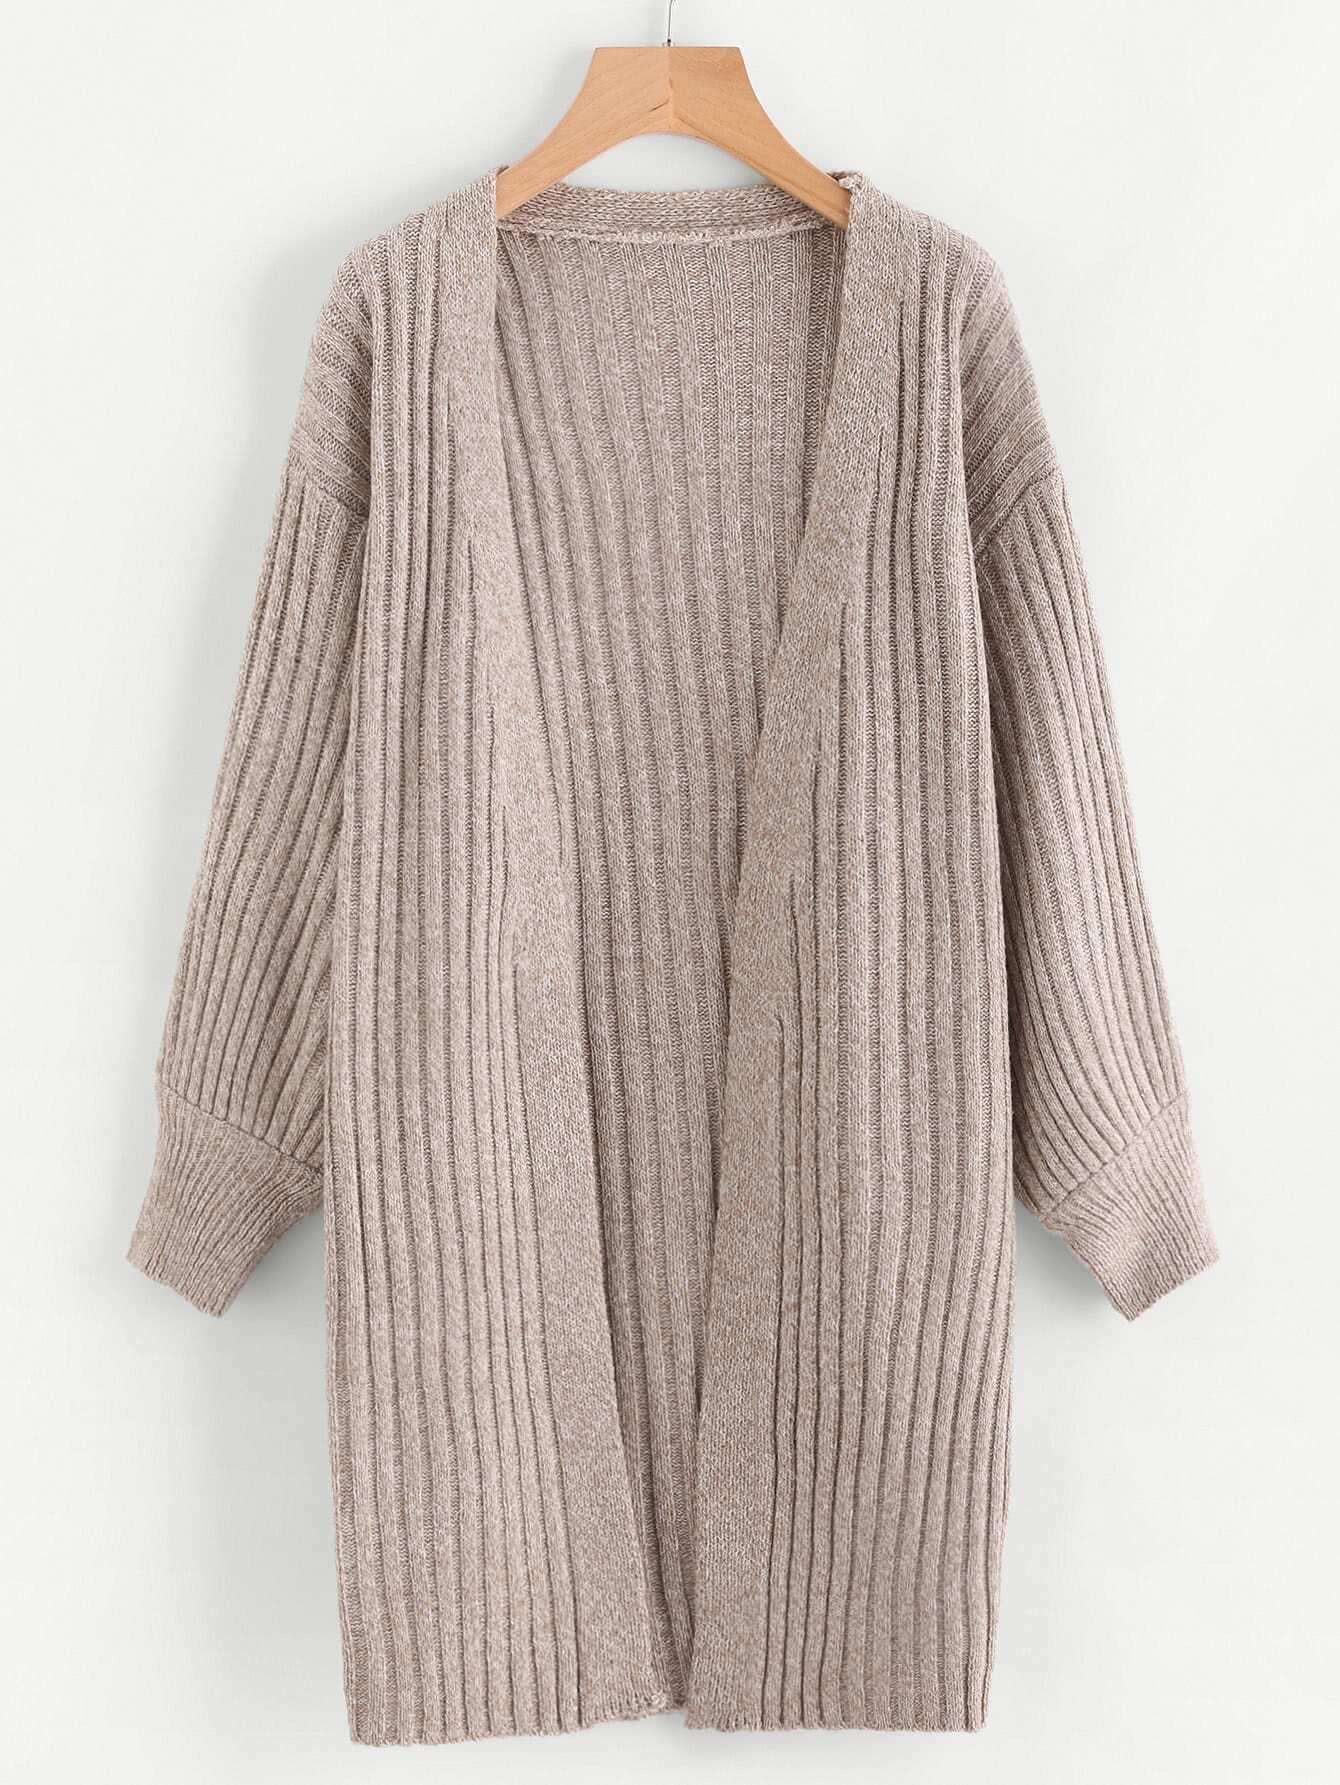 Drop Shoulder Slub Sweater Coat sweater170825104